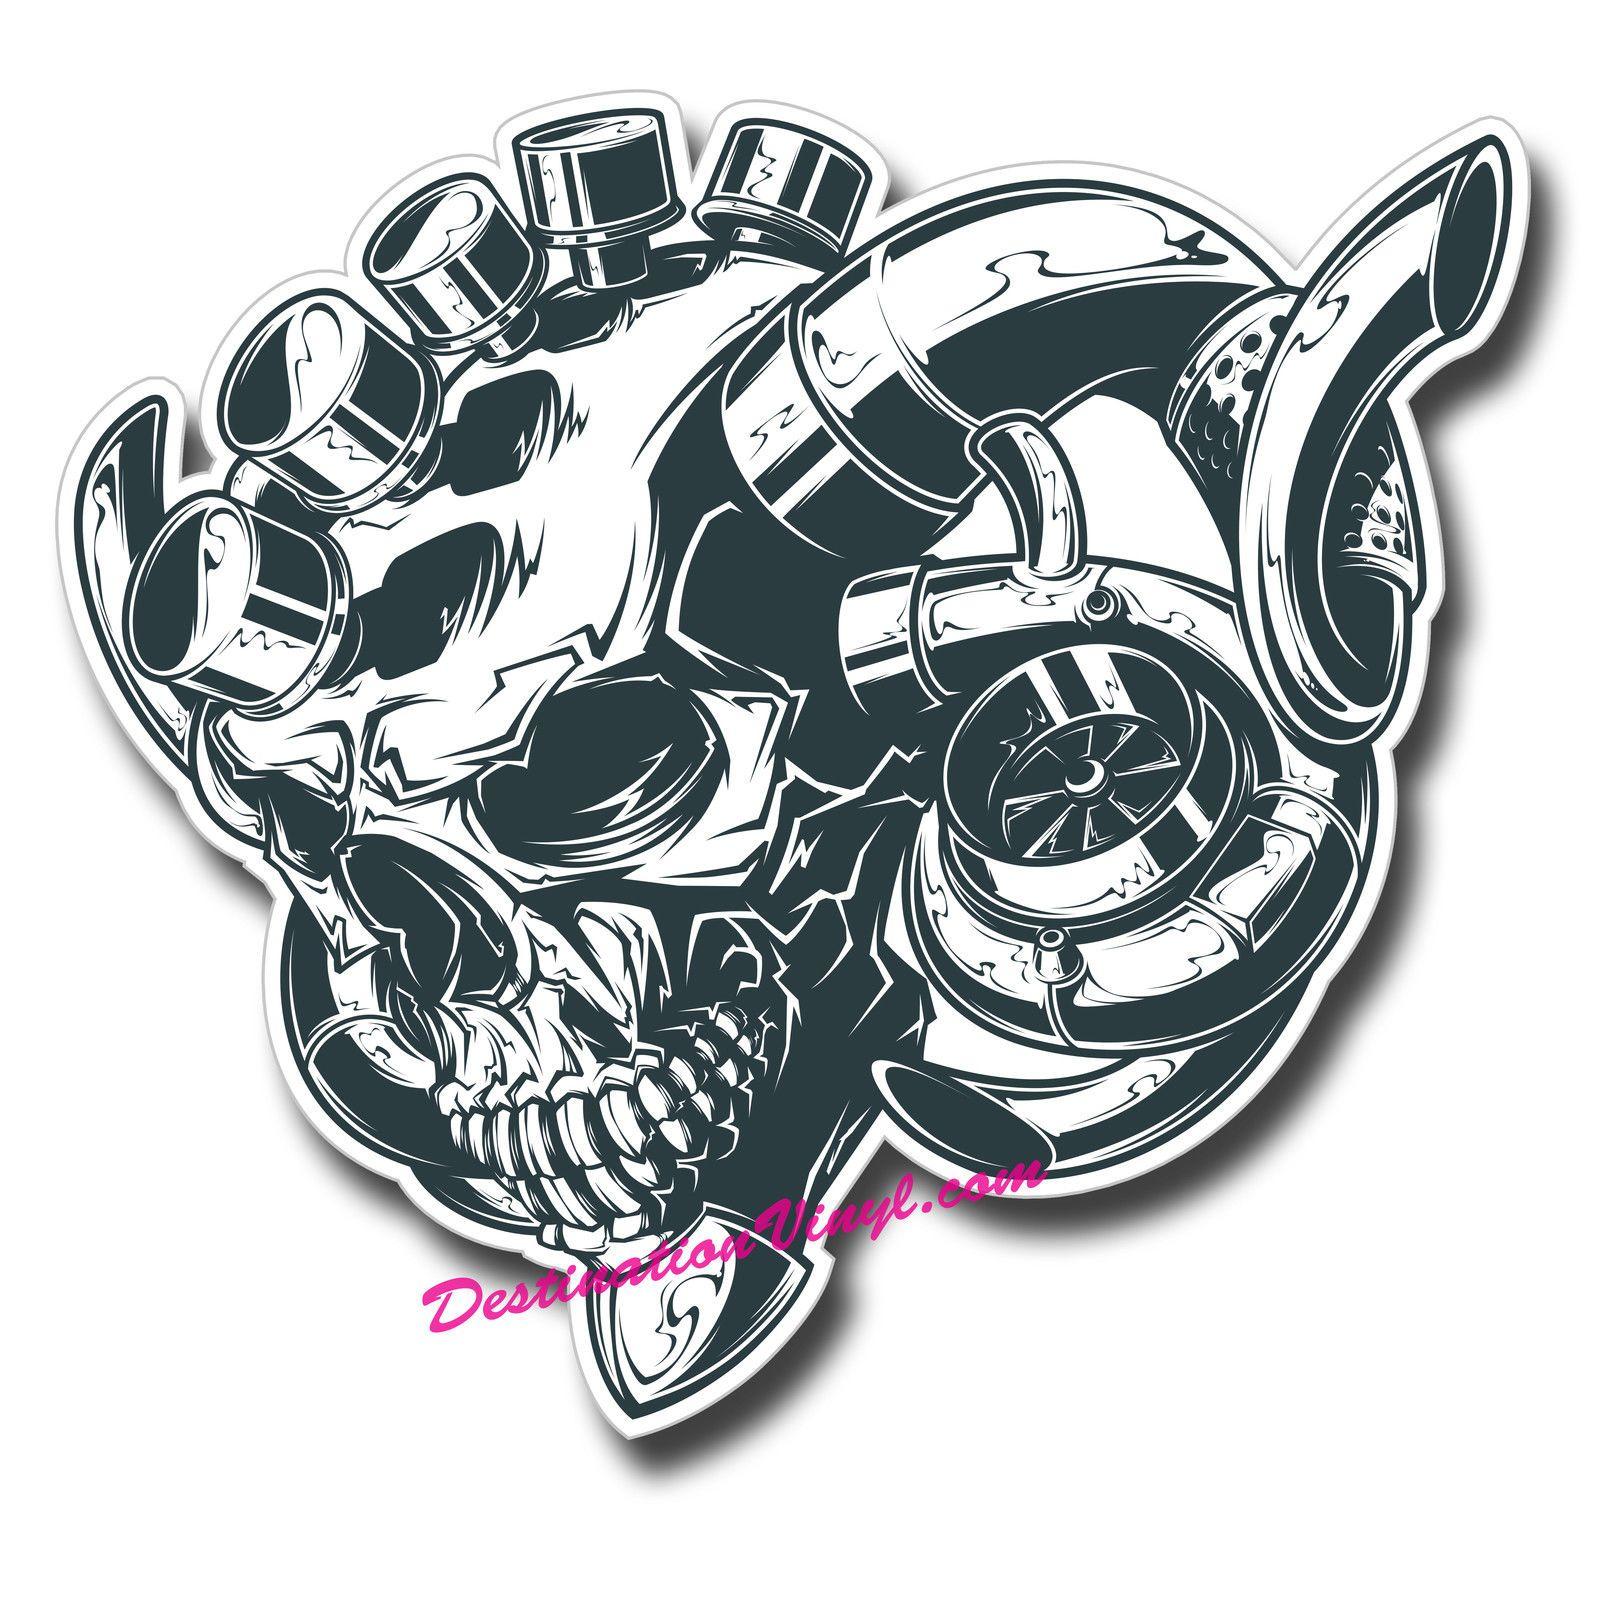 Turbo P Harley: Turbo Skull Car Engine JDM